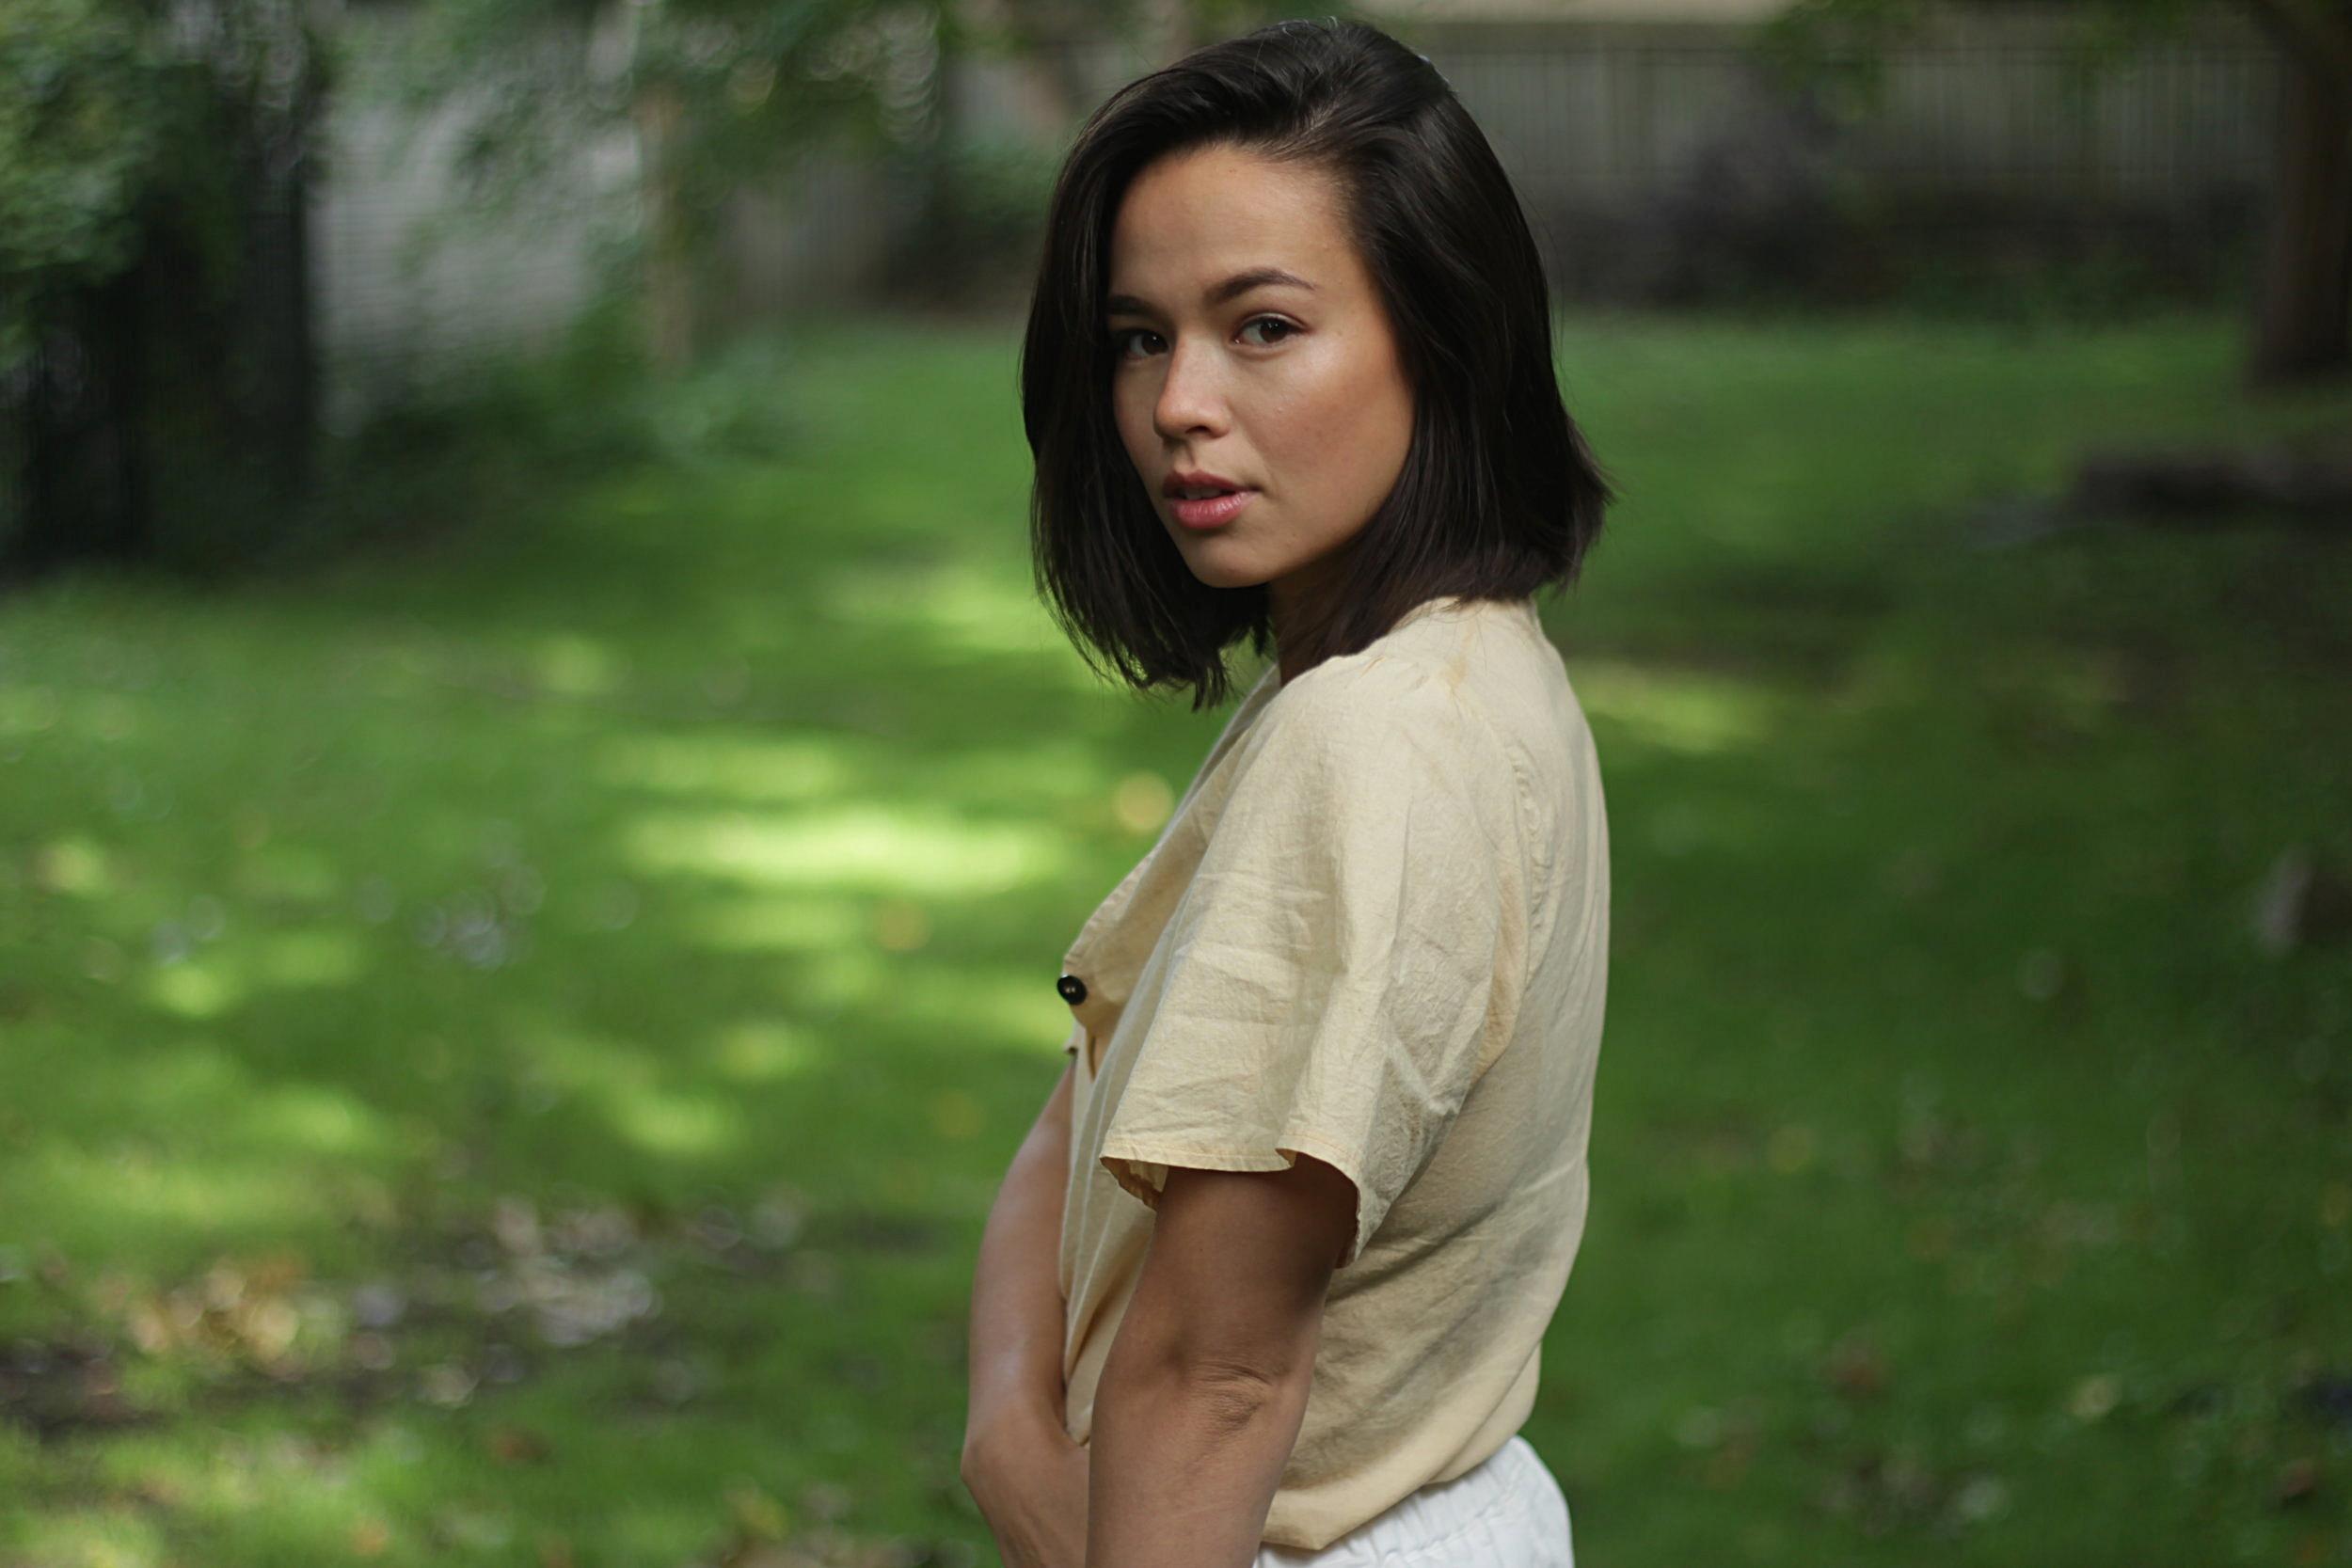 Wearing Abel Wear's organic cotton blouse.